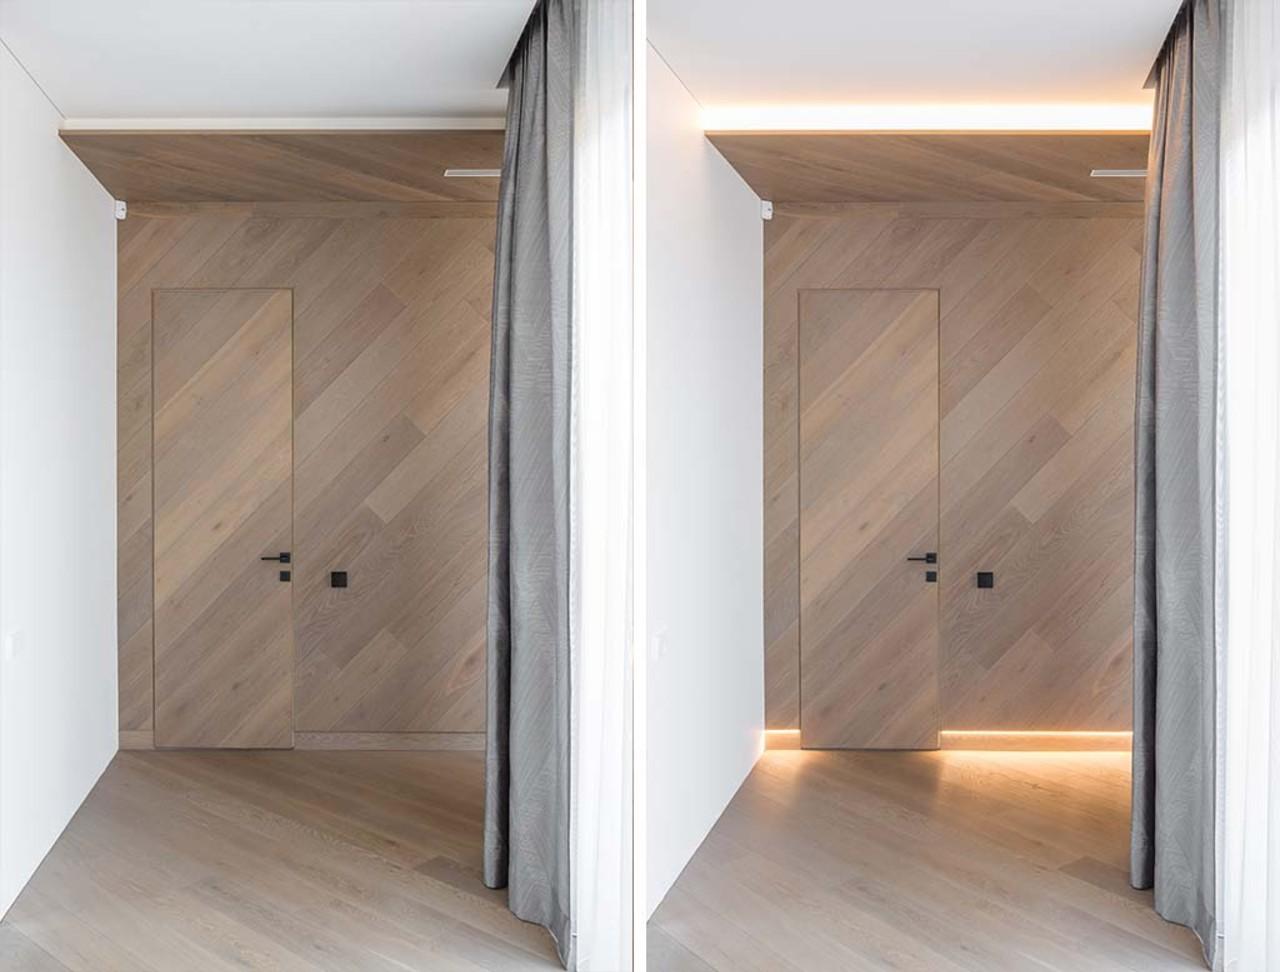 Sodybos interjeras durys